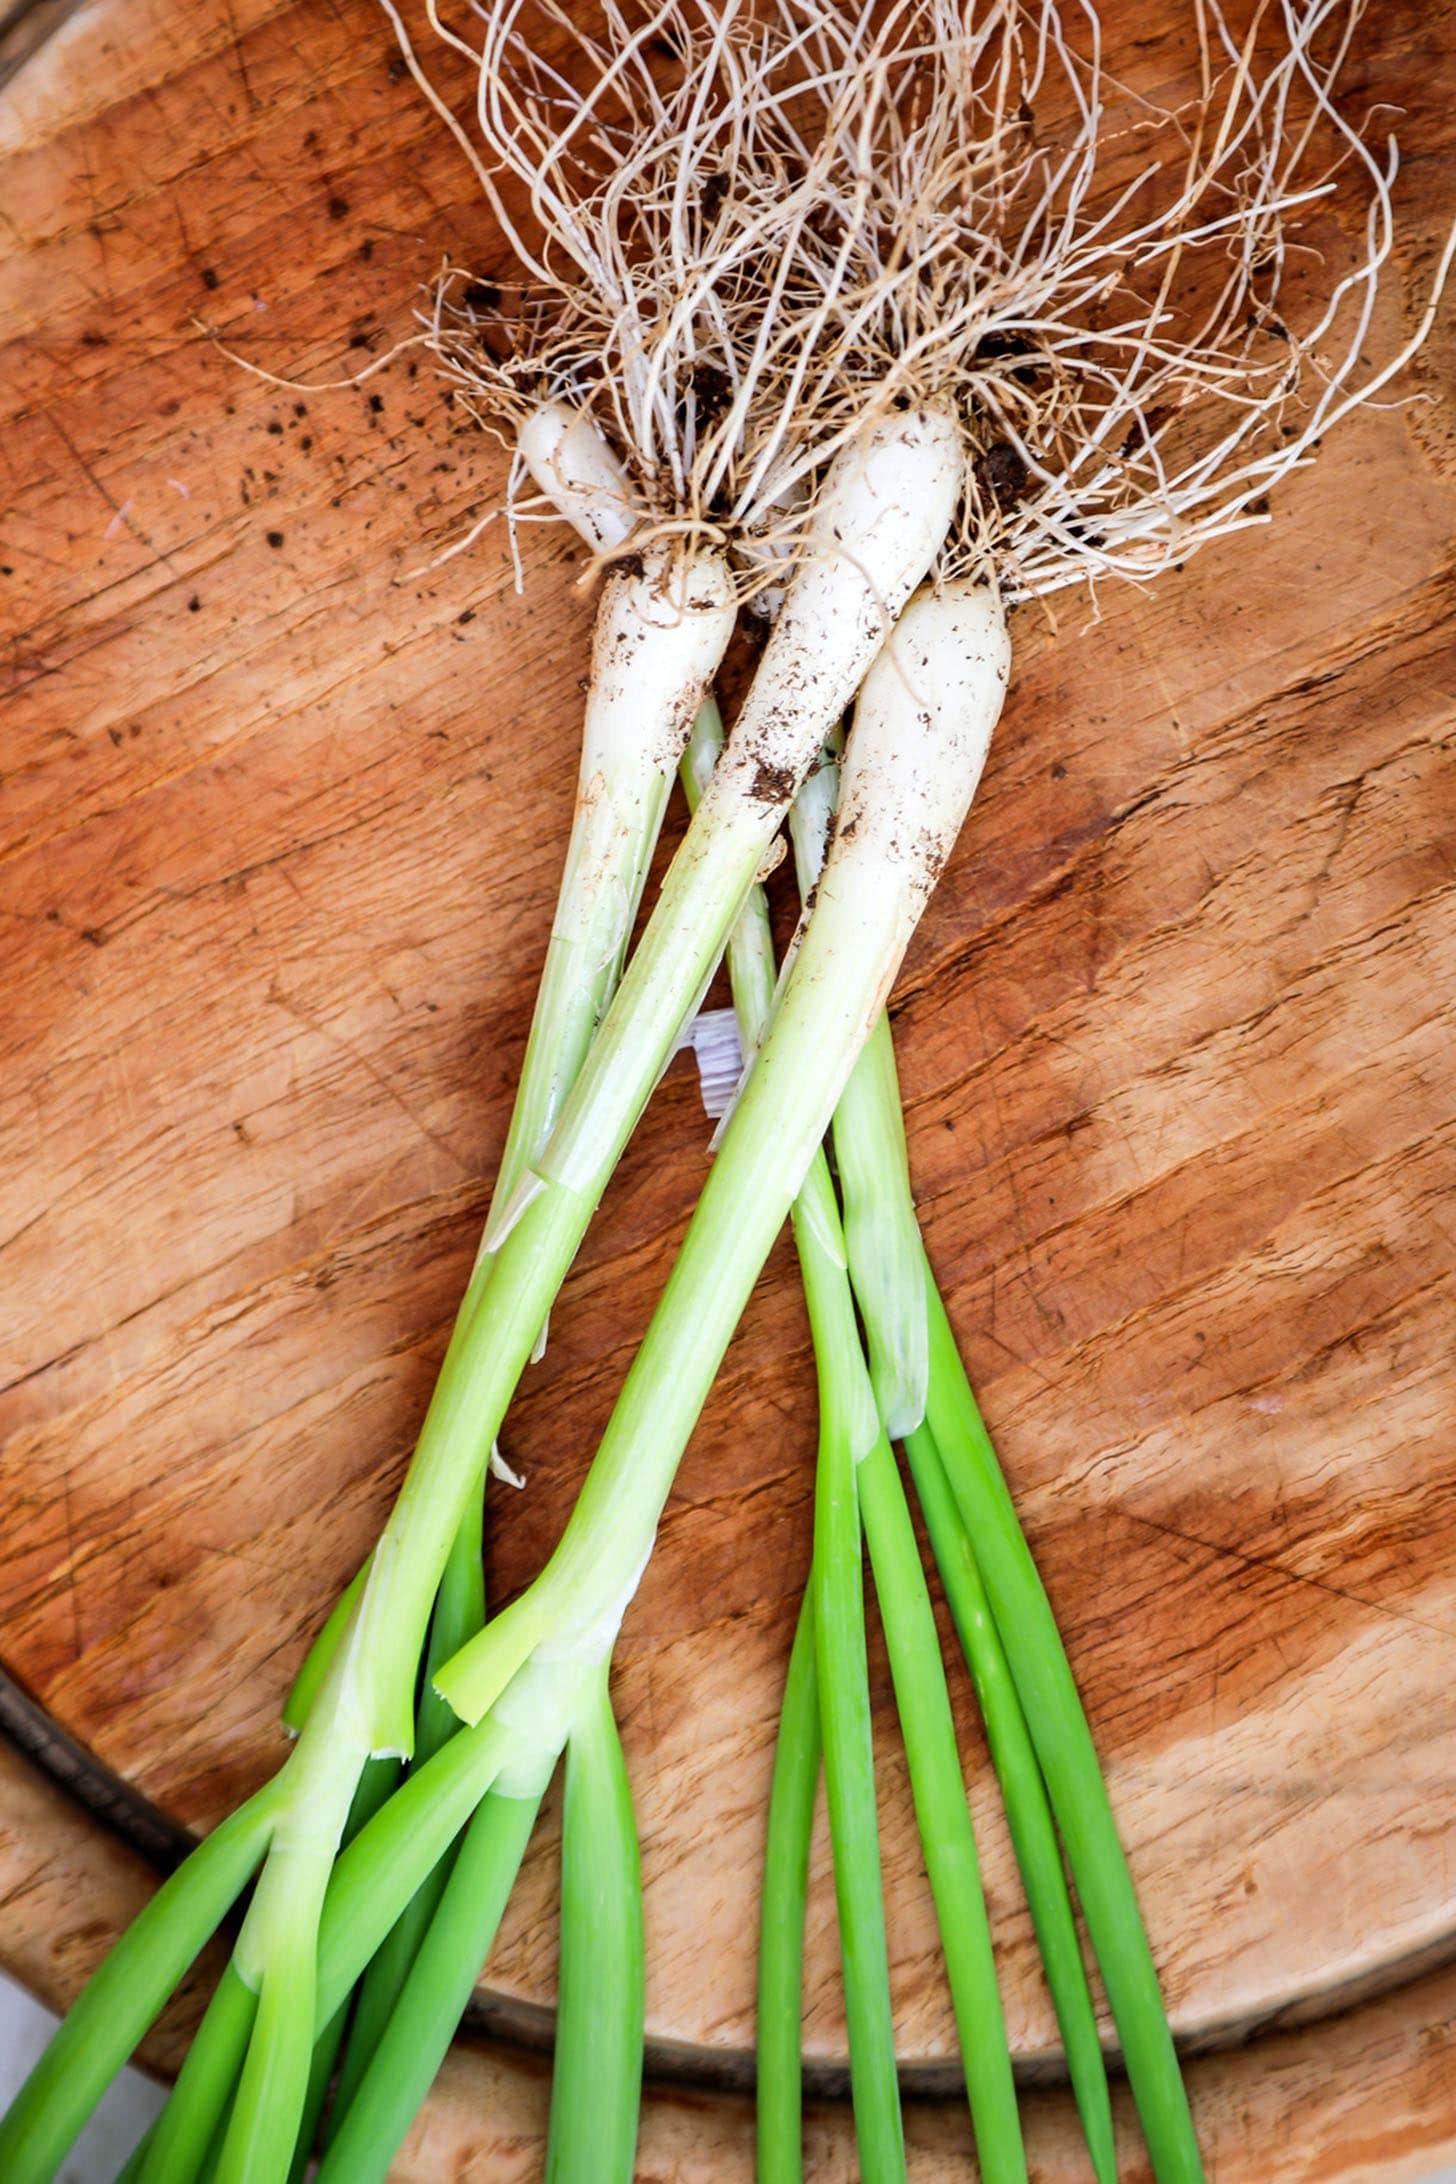 Scallions_vs_Green_Onions_1